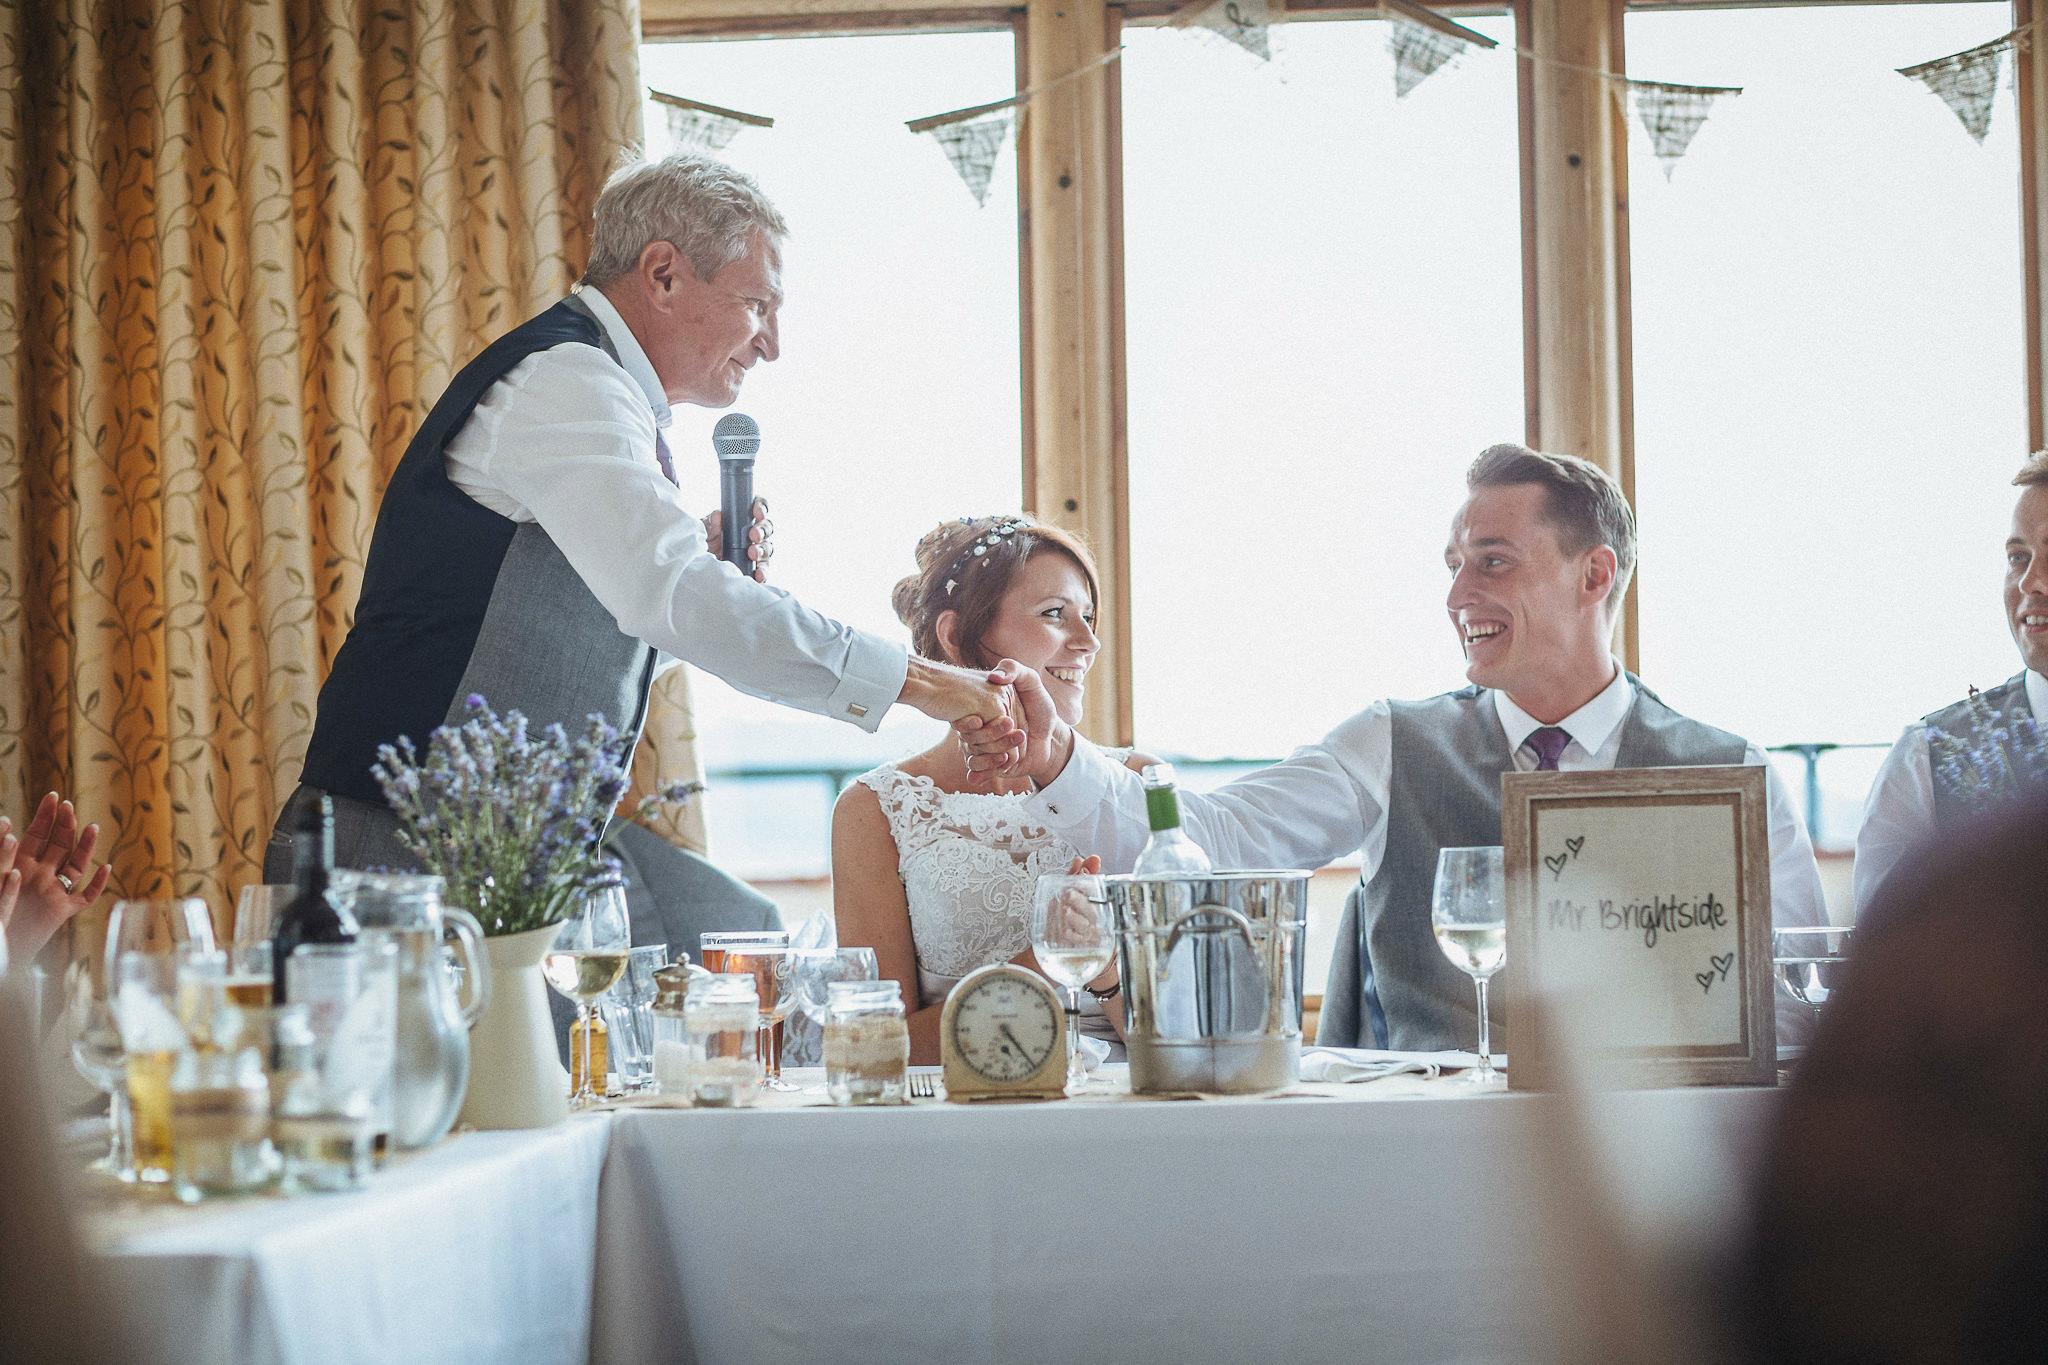 paul-marbrook-Caer-Llan-Wedding-Photographer-90079